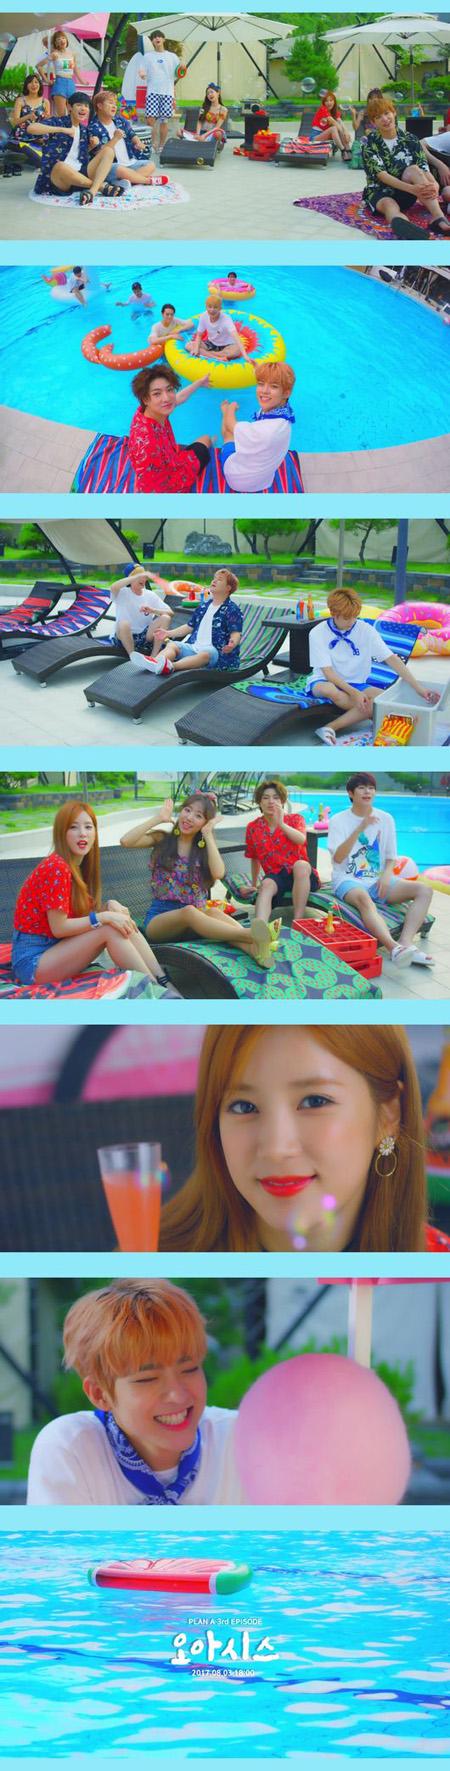 「Apink」&ホガク&「VICTON」、サマーソング「OASIS」MVティーザー映像公開! (提供:OSEN)